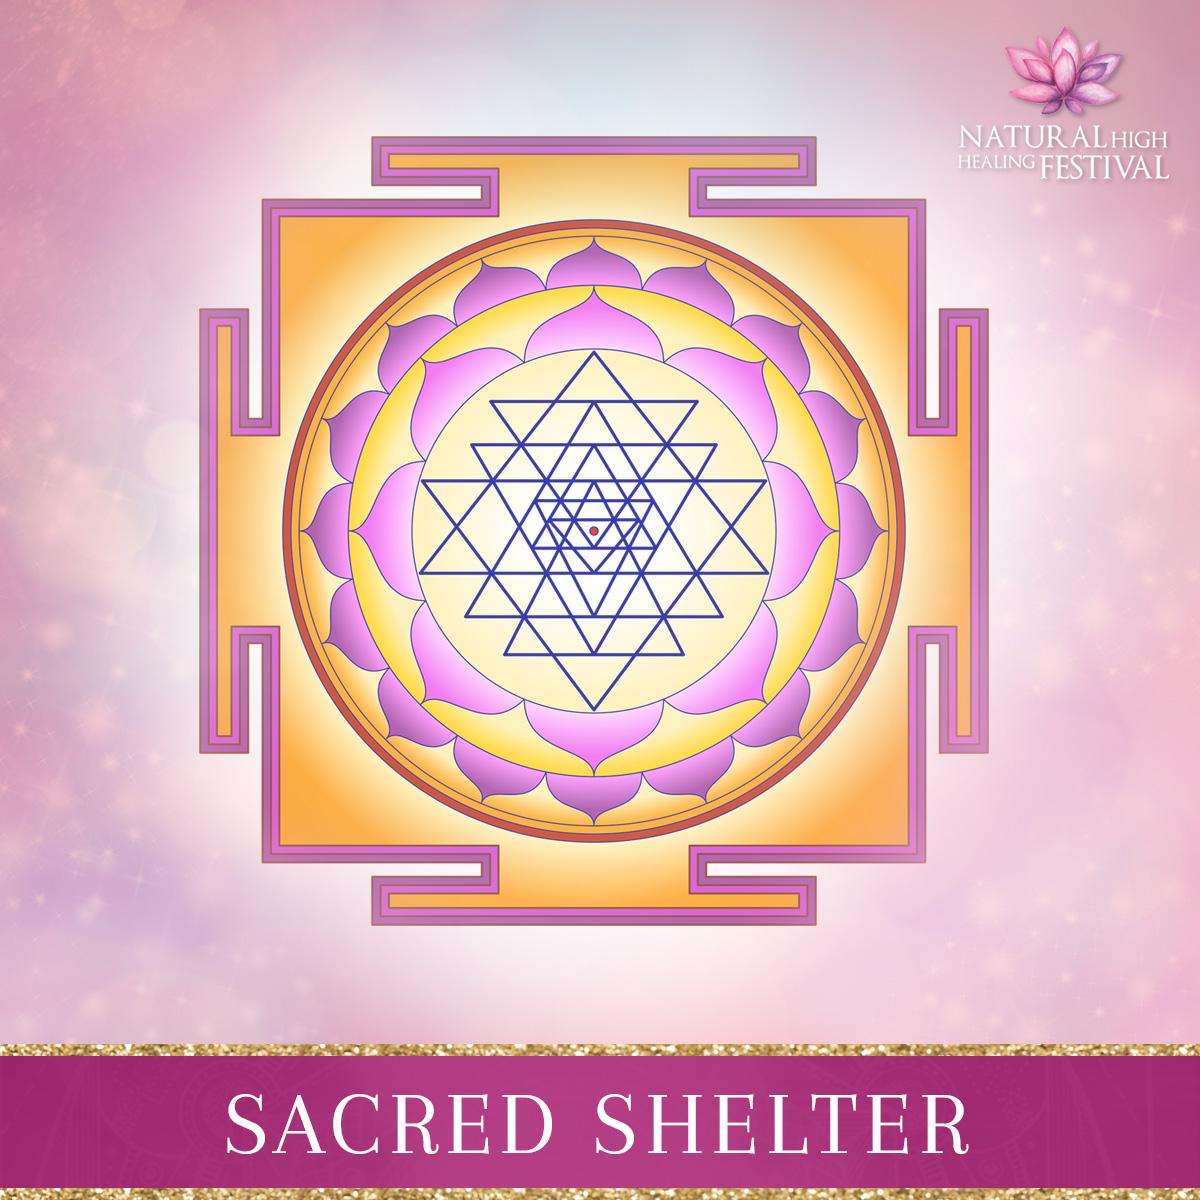 Sacred Shelter at natural high festival